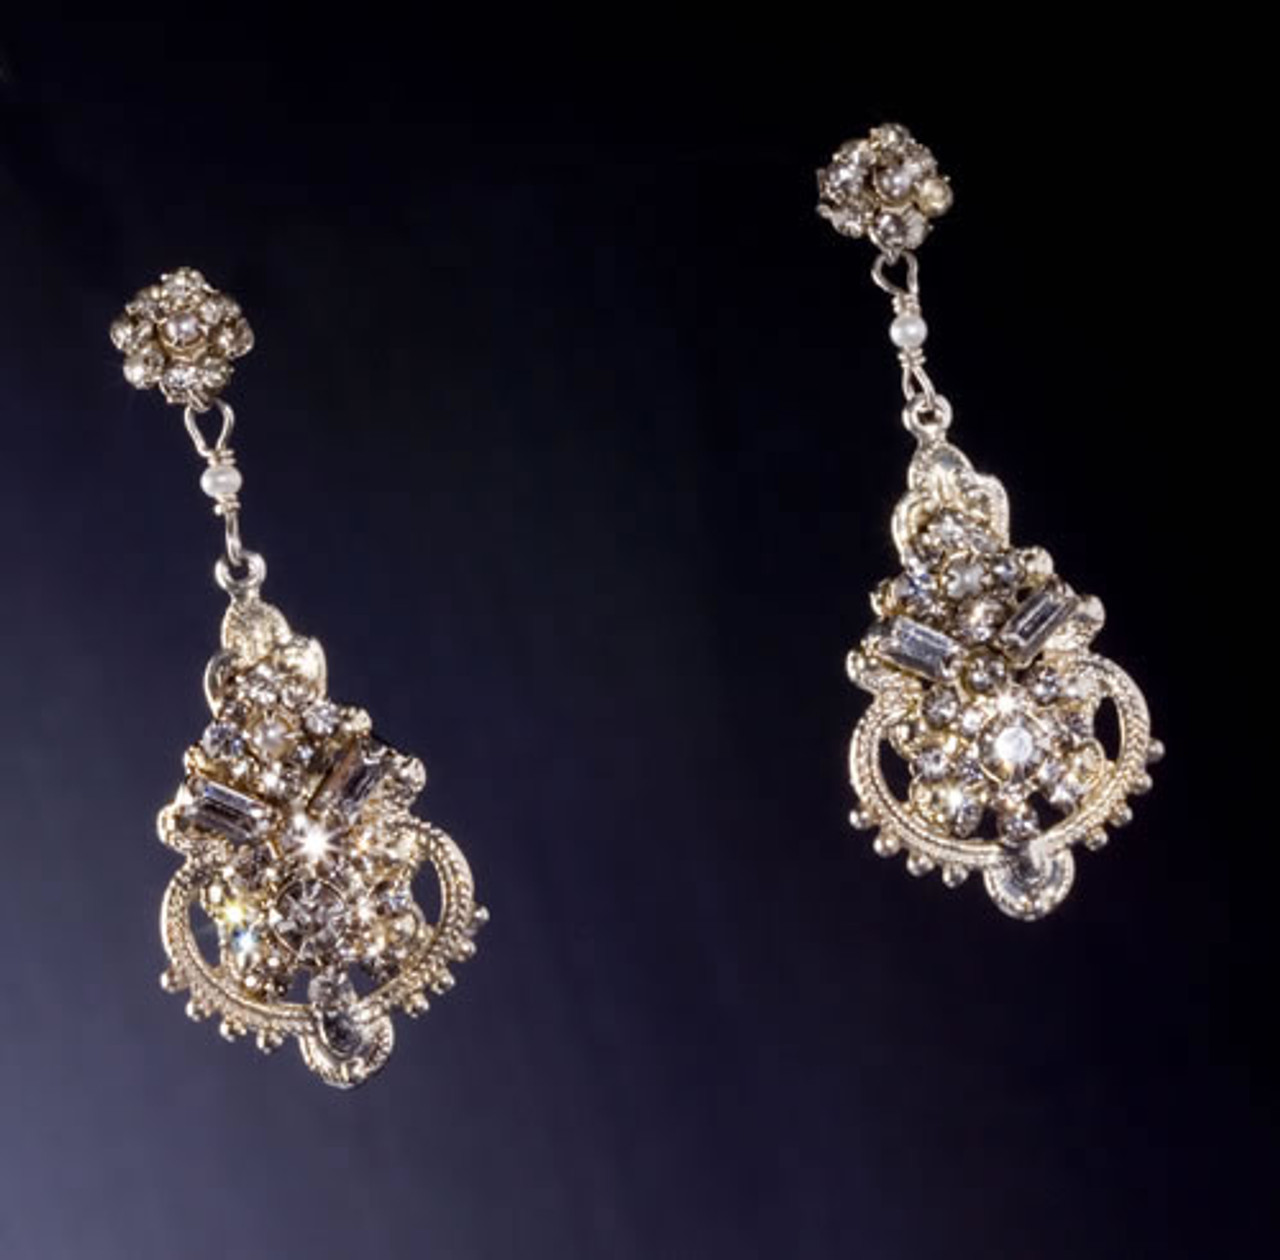 Erica Koesler Jewelry - Style J-9147